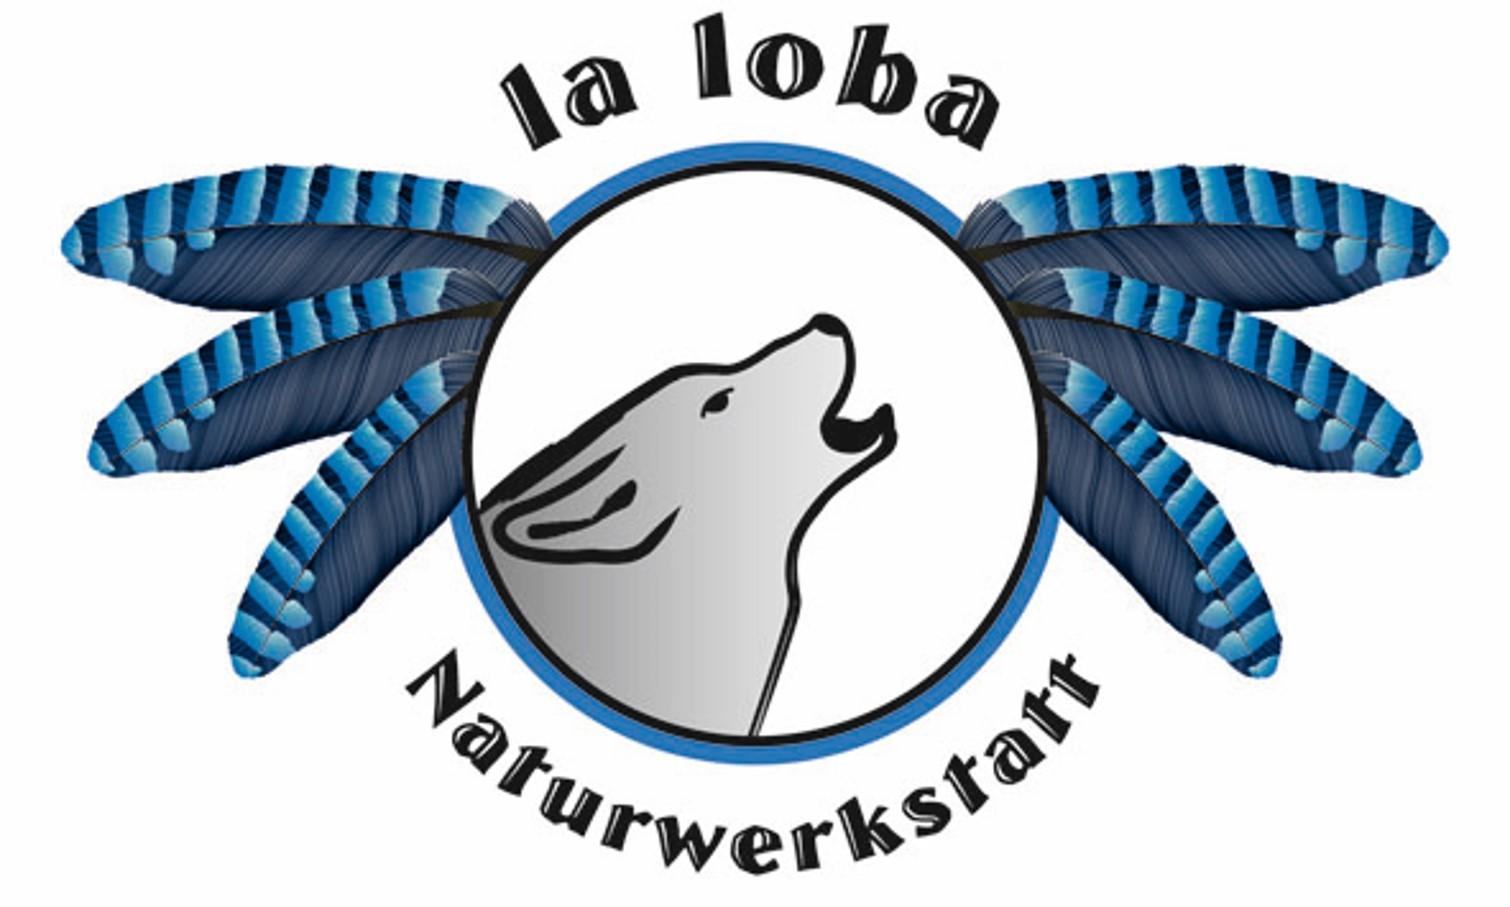 www.laloba-naturwerkstatt.ch